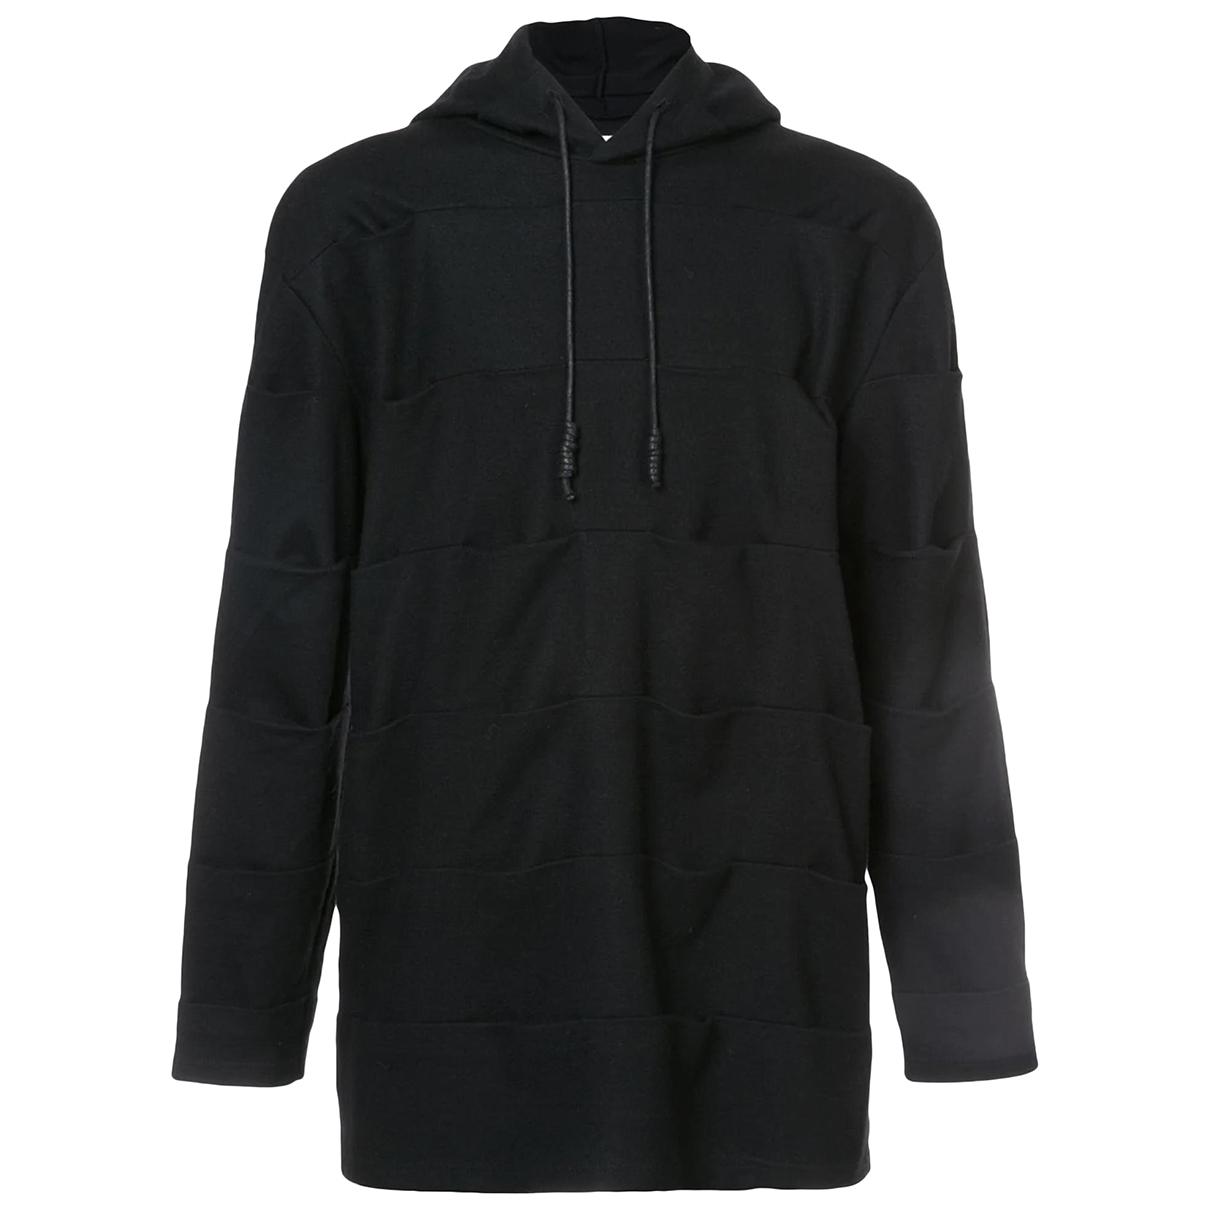 Autre Marque \N Black Wool Knitwear & Sweatshirts for Men L International